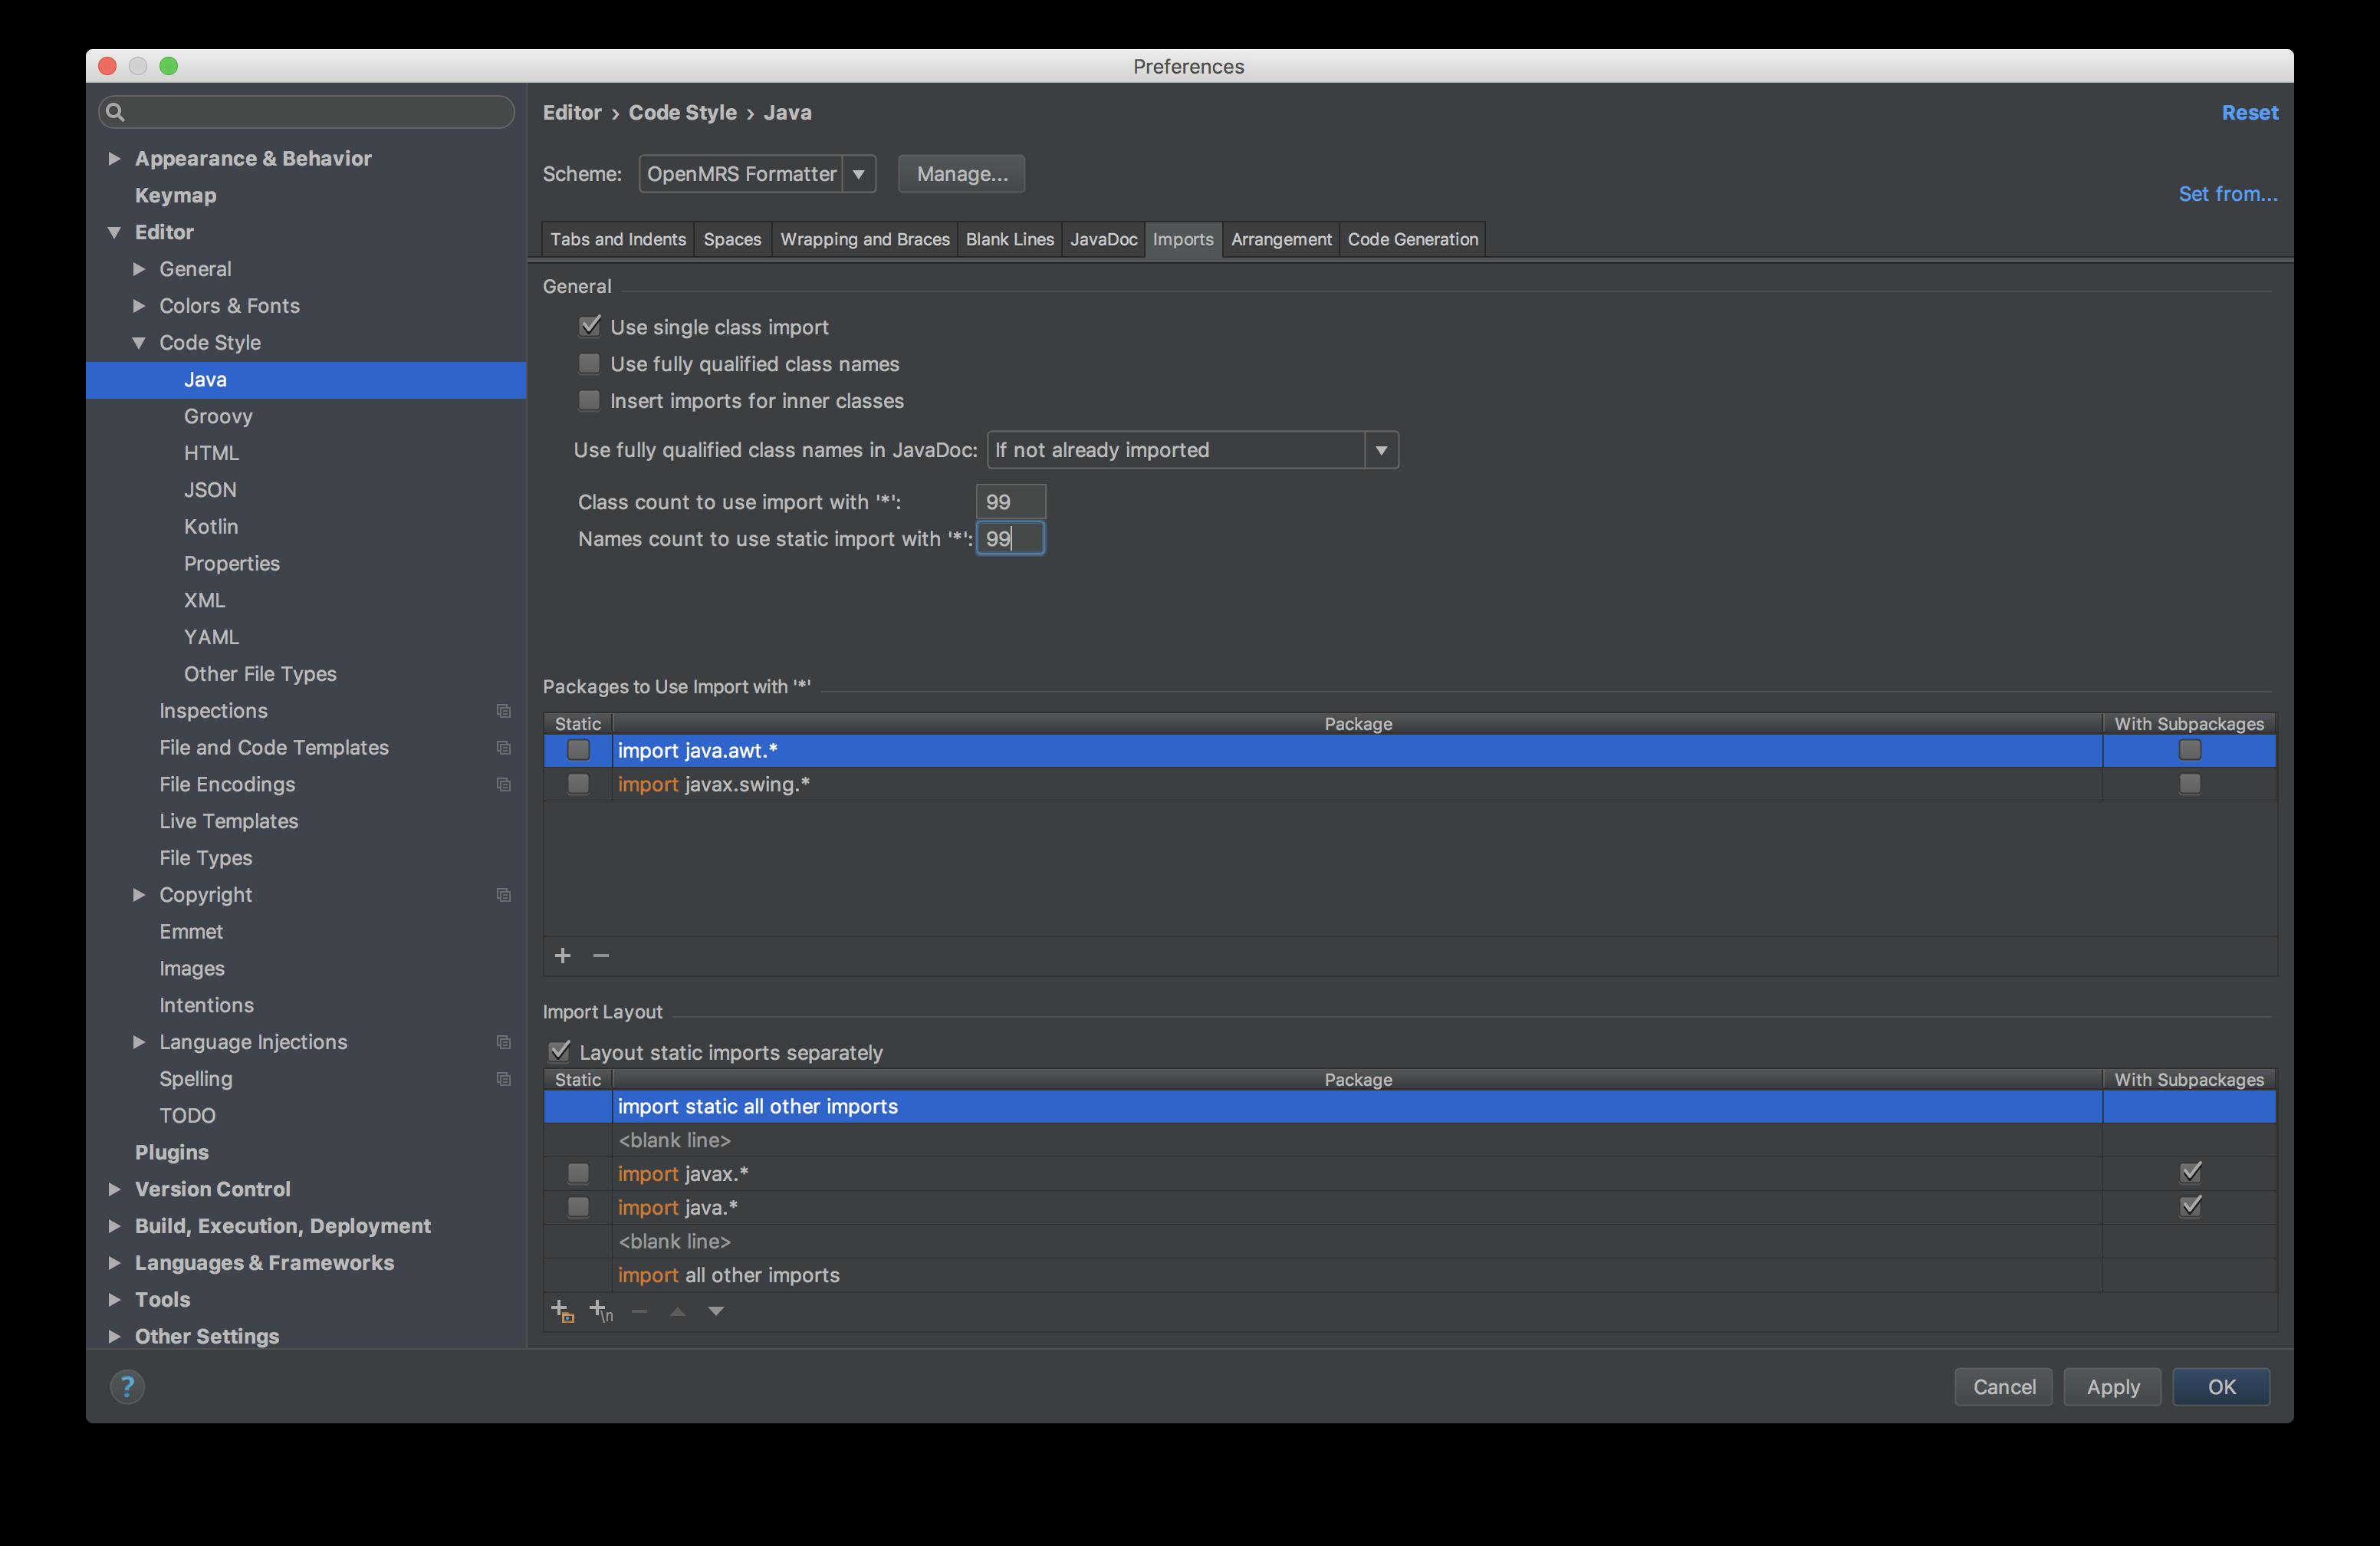 Java:Imports settings